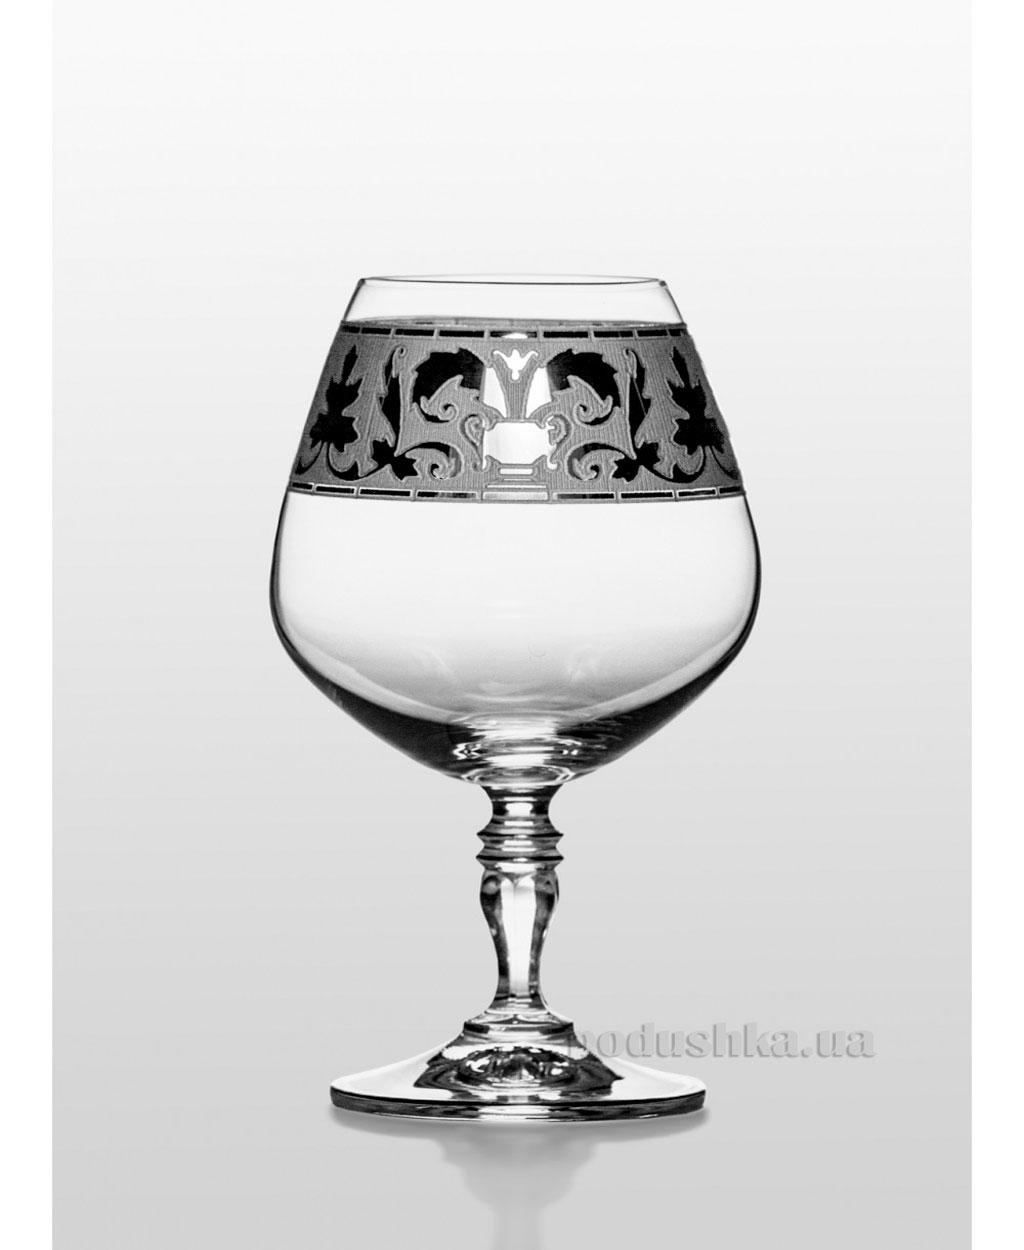 Набор бокалов для коньяка Victoria Bohemia Sklo Rene платина 02-06-380-6-014